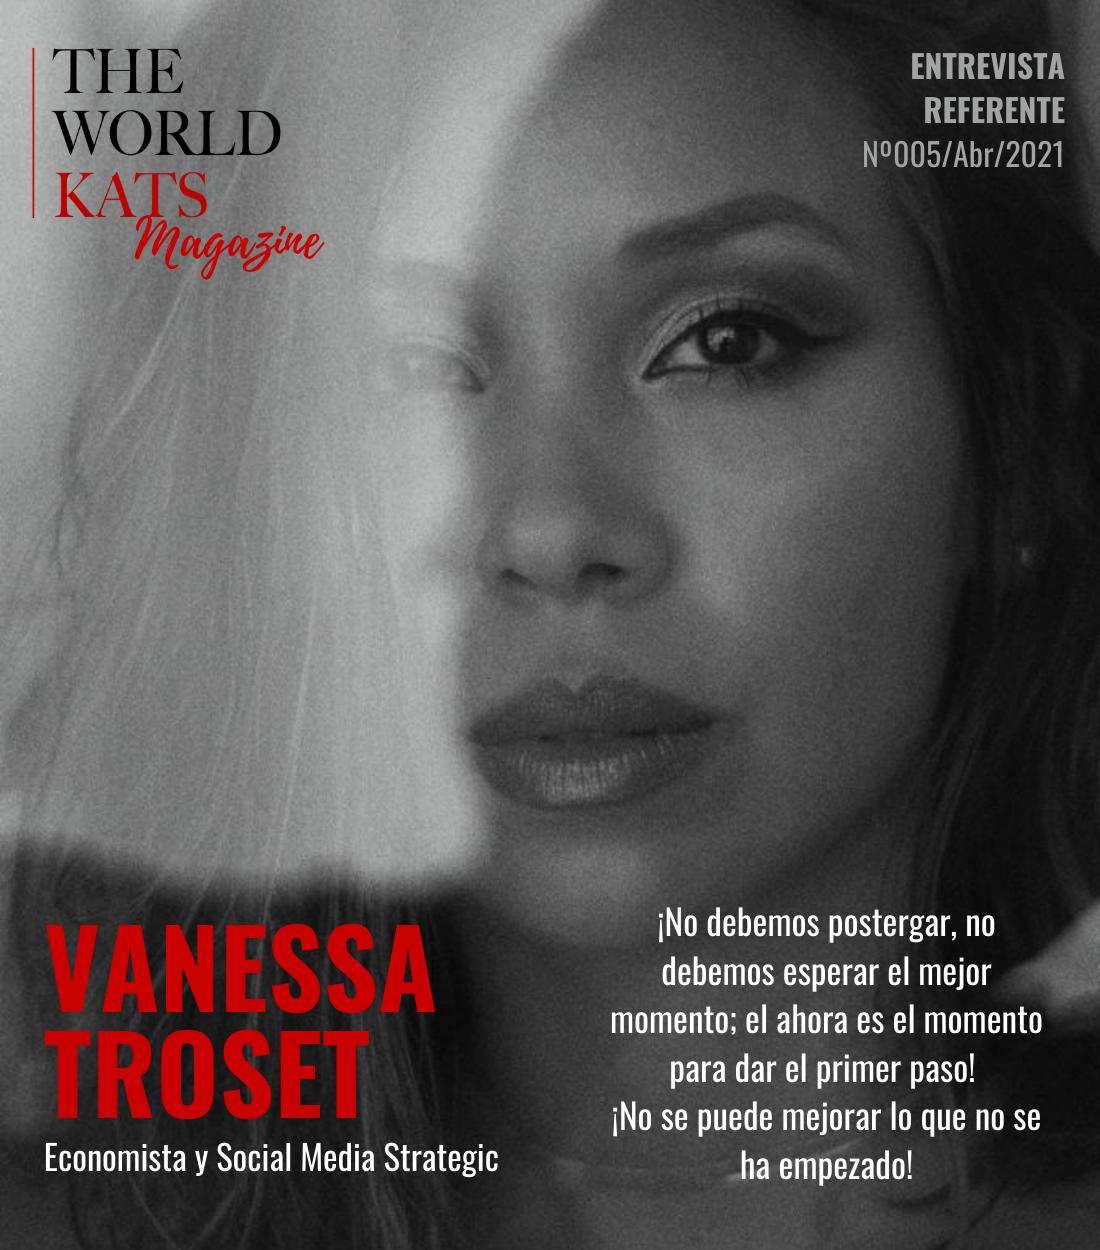 Entrevista a Vanessa Troset